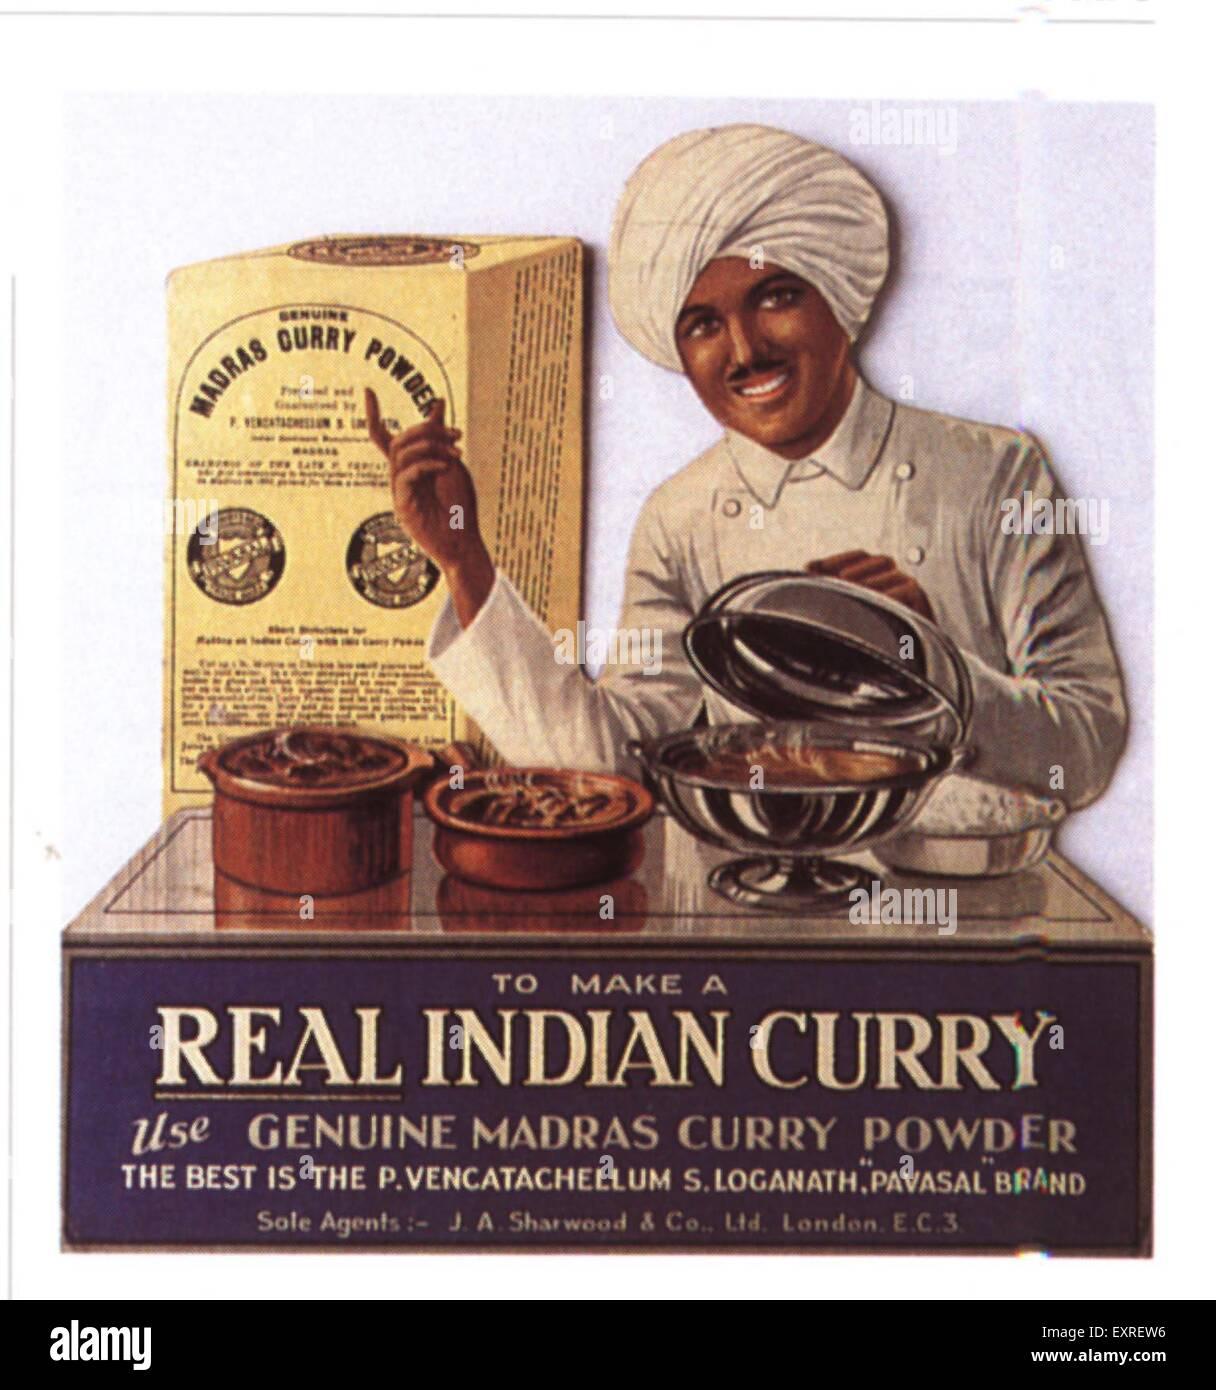 1910s UK Indian Food Curry Magazine Advert Stock Photo